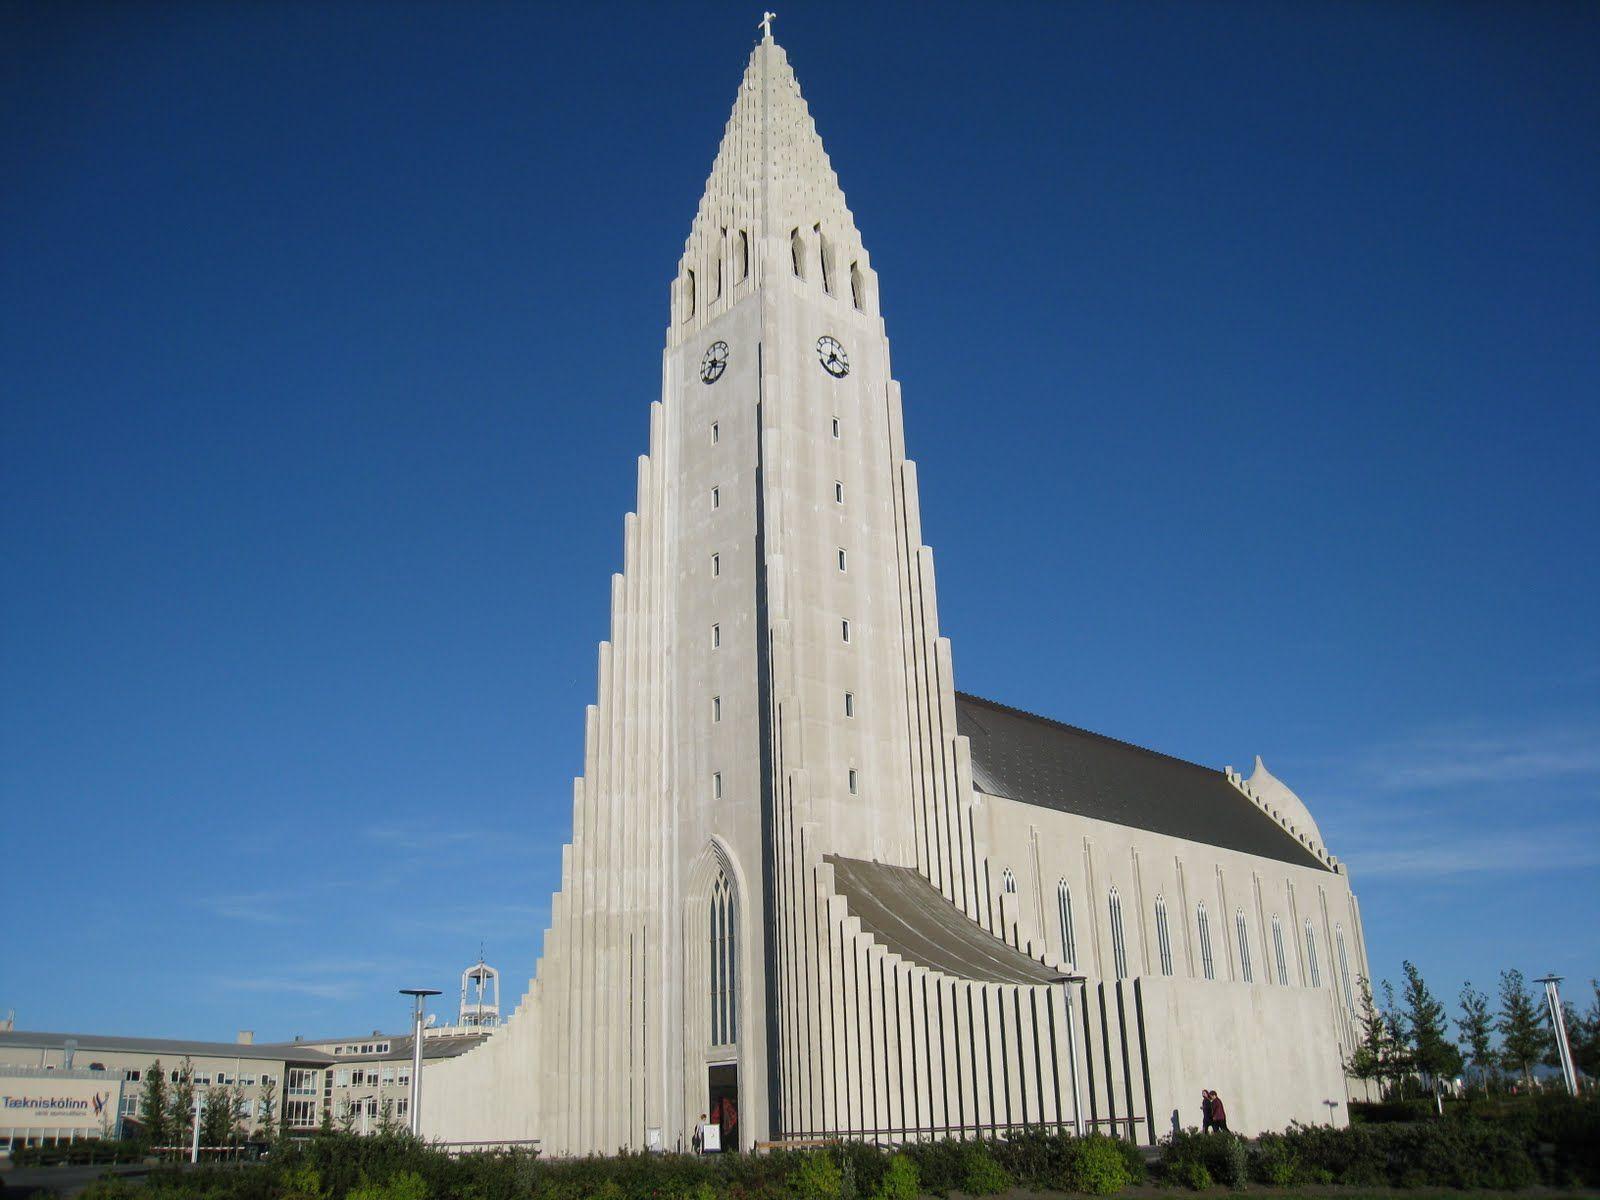 Pin By Reykjavik Reykjavik On Mobile Wallpaper: Wallpaper Of Church Of Iceland